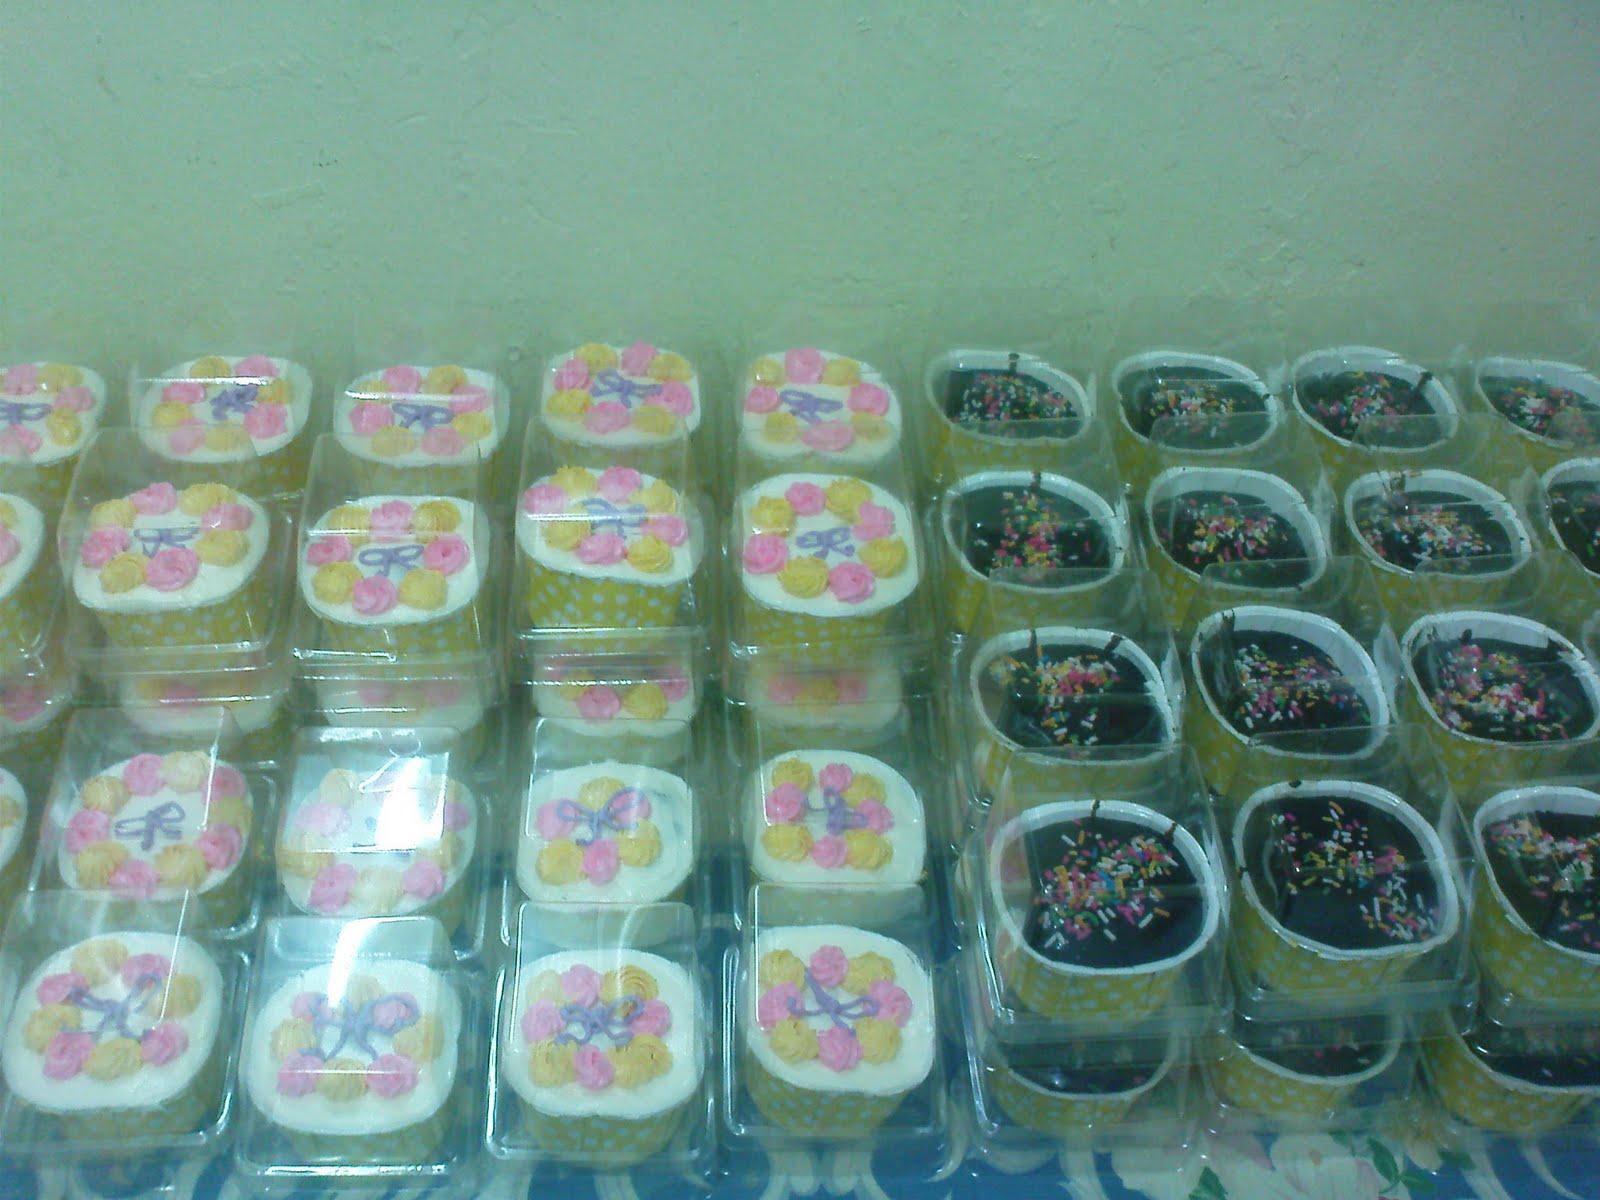 Cupcakes door gift majlis perkahwinan si manis comel for Idea door gift perkahwinan